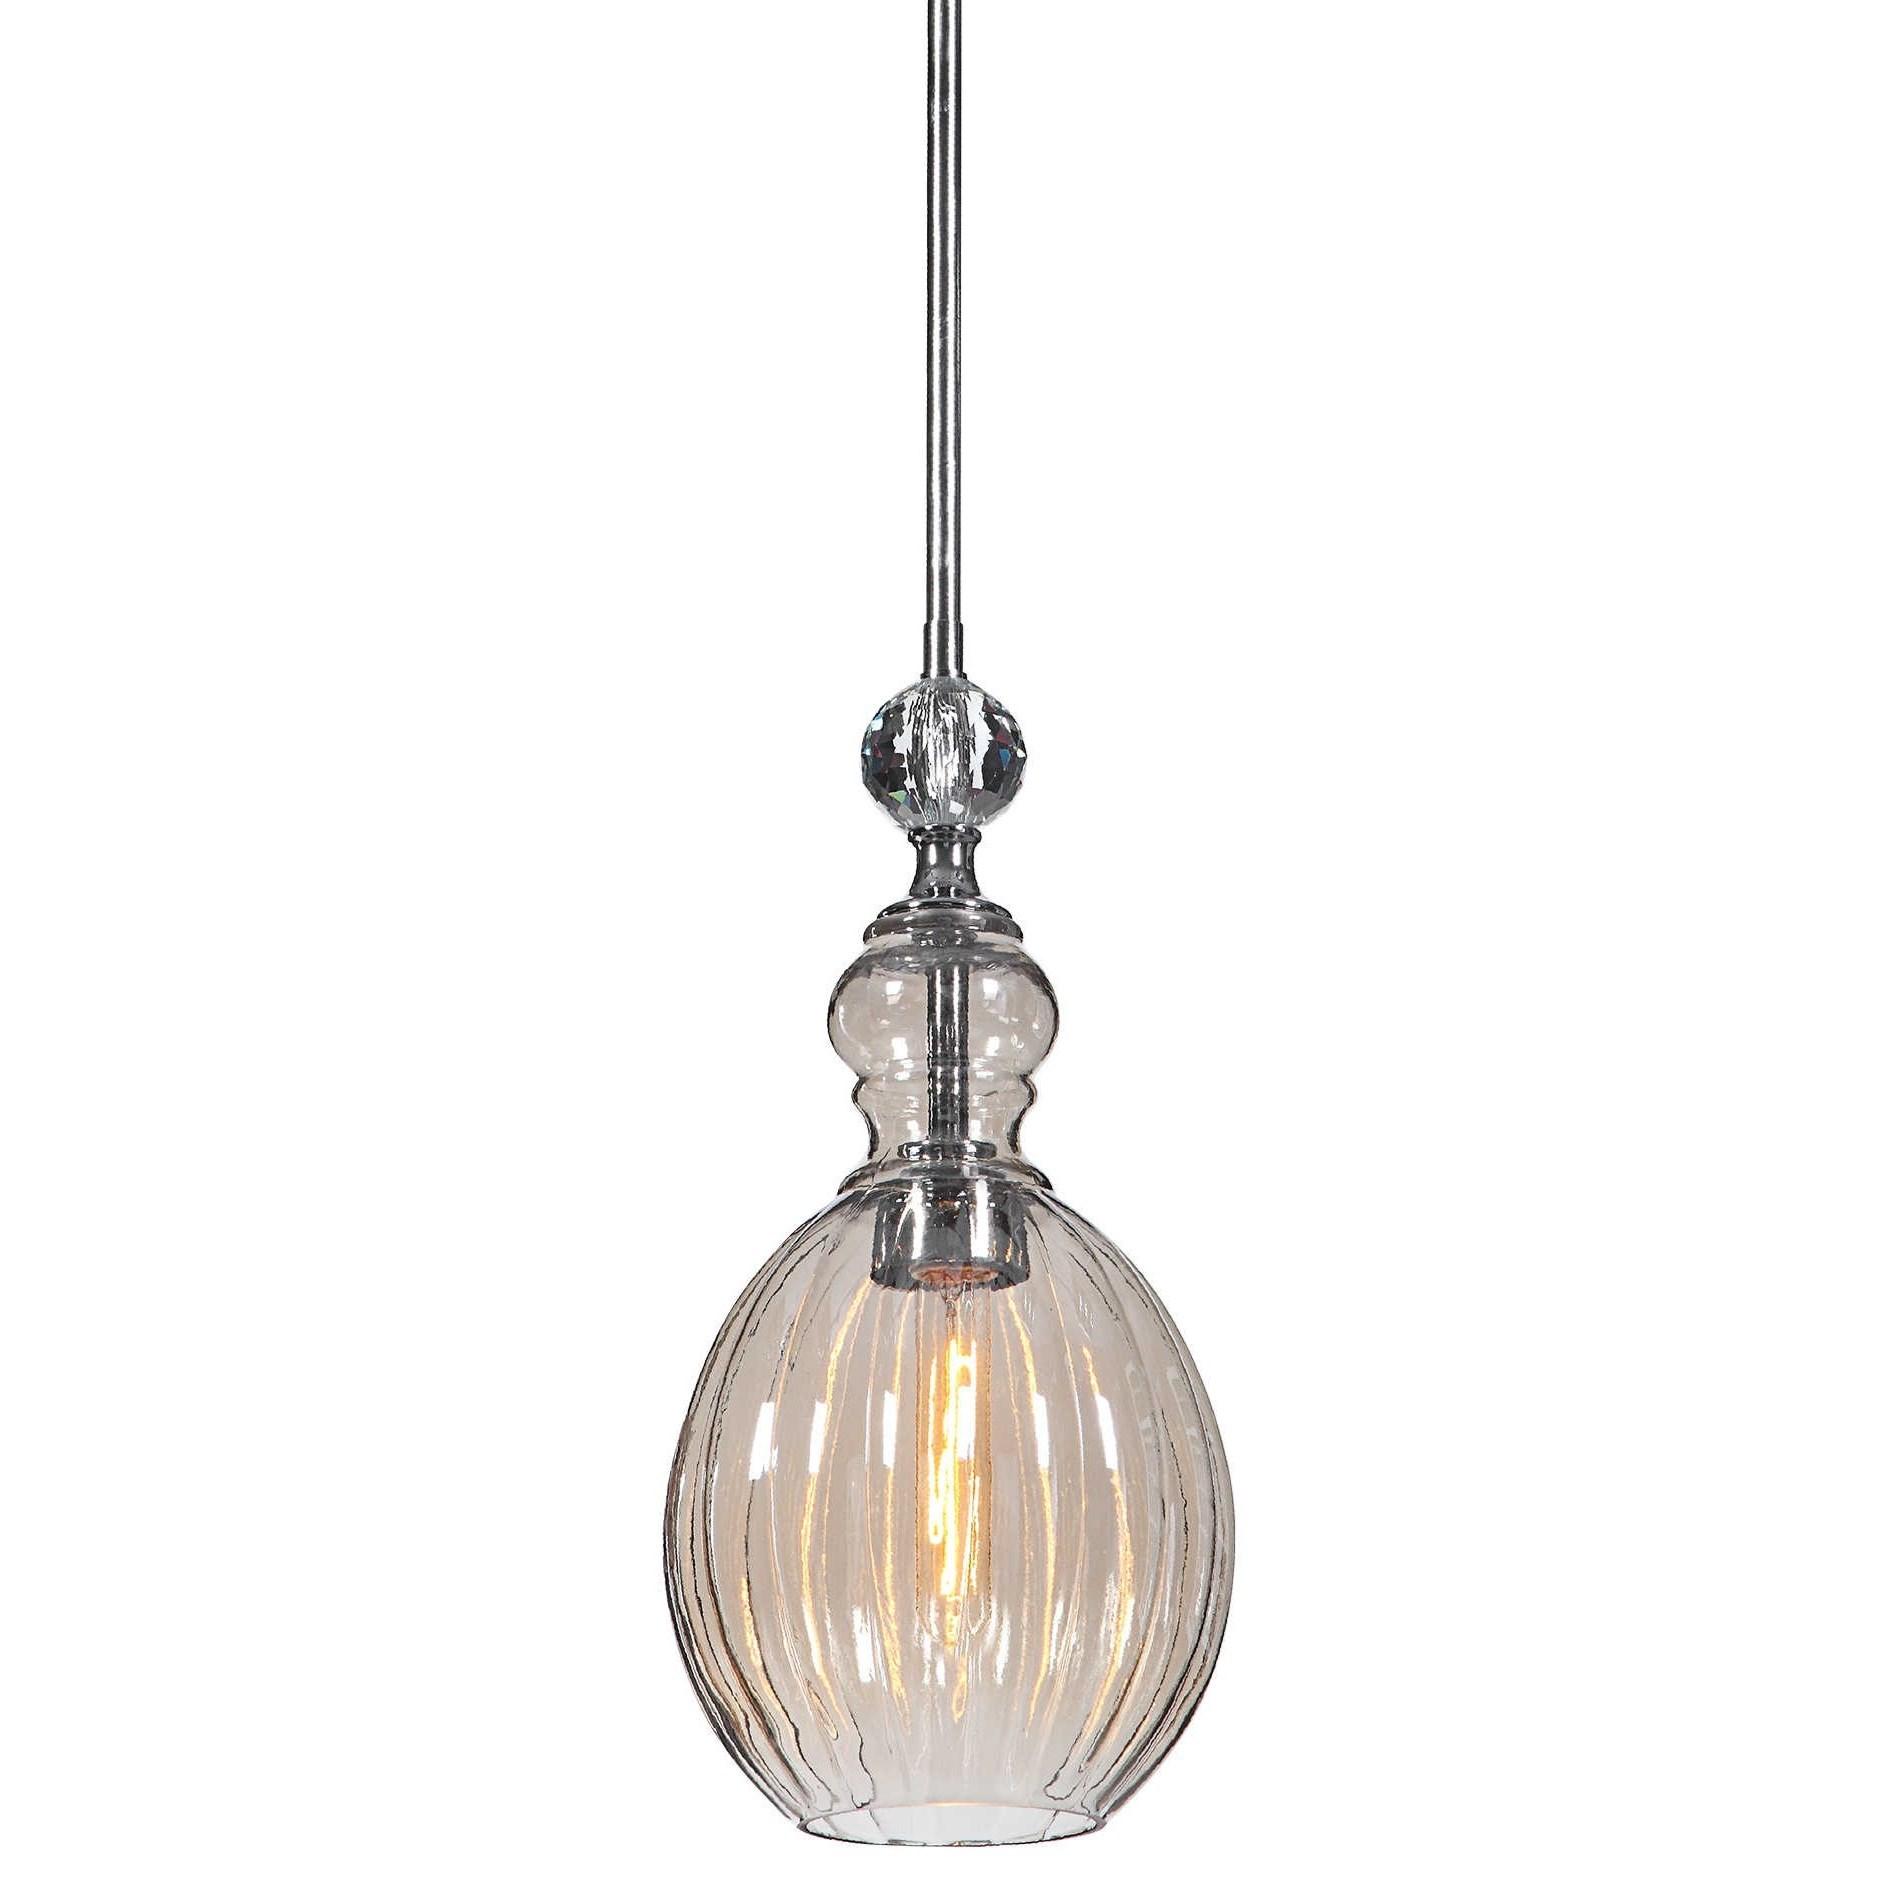 Lighting Fixtures - Pendant Lights GiGi 1 Light Glass Mini Pendant by Uttermost at Mueller Furniture